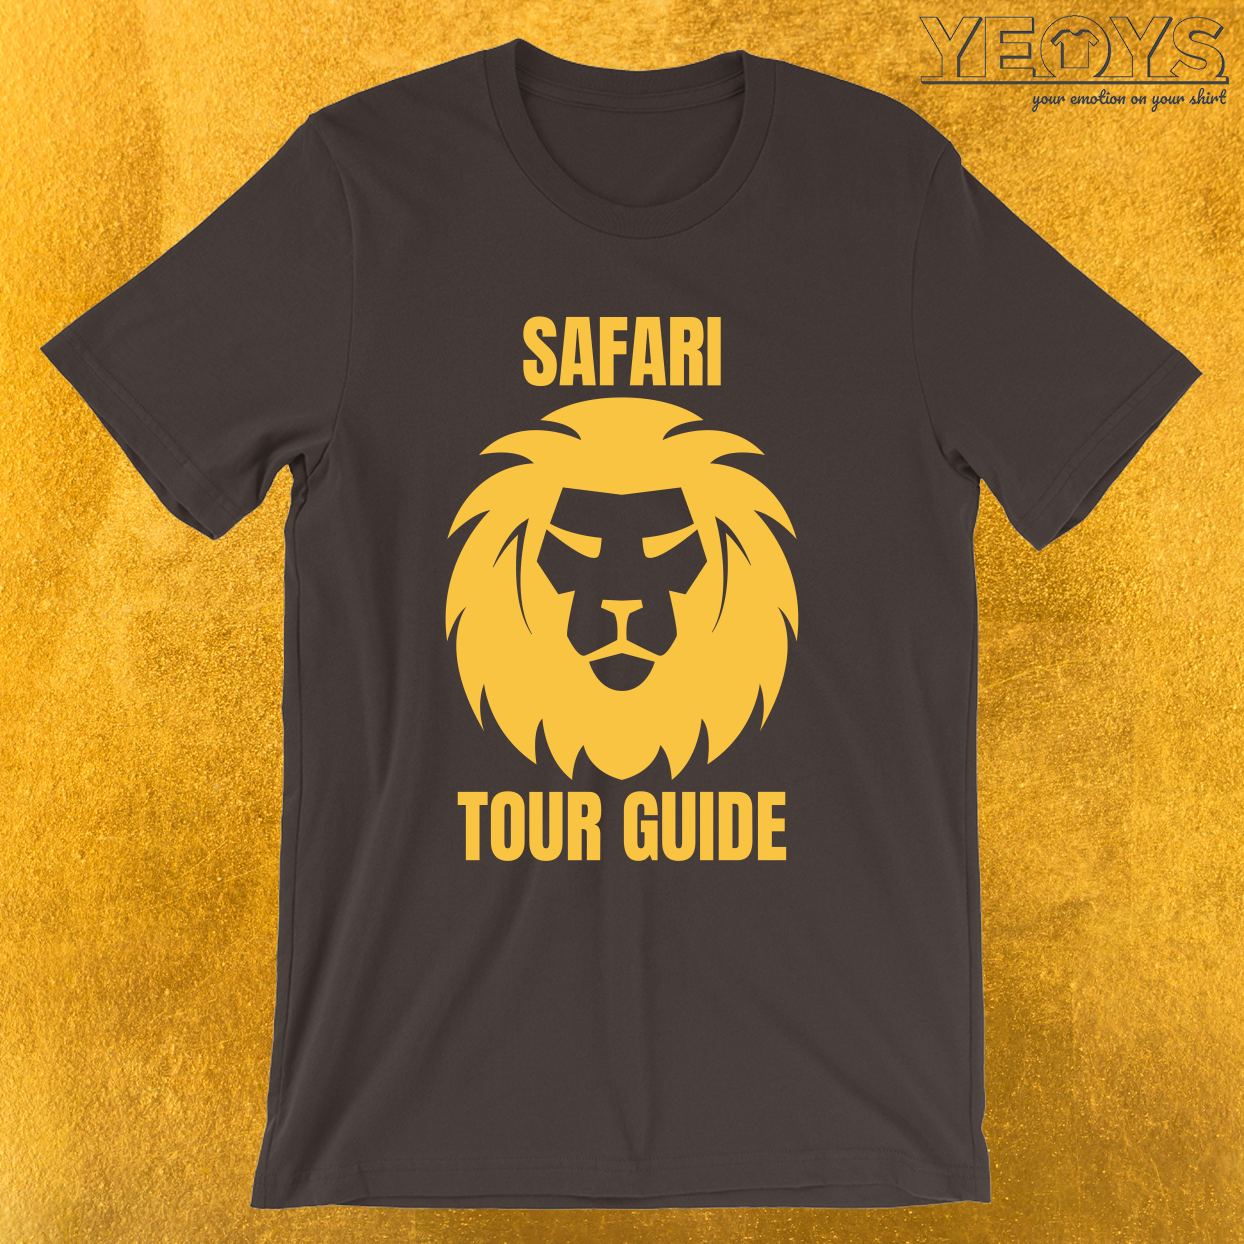 Safari Tour Guide – Cool Safari Guide Tee